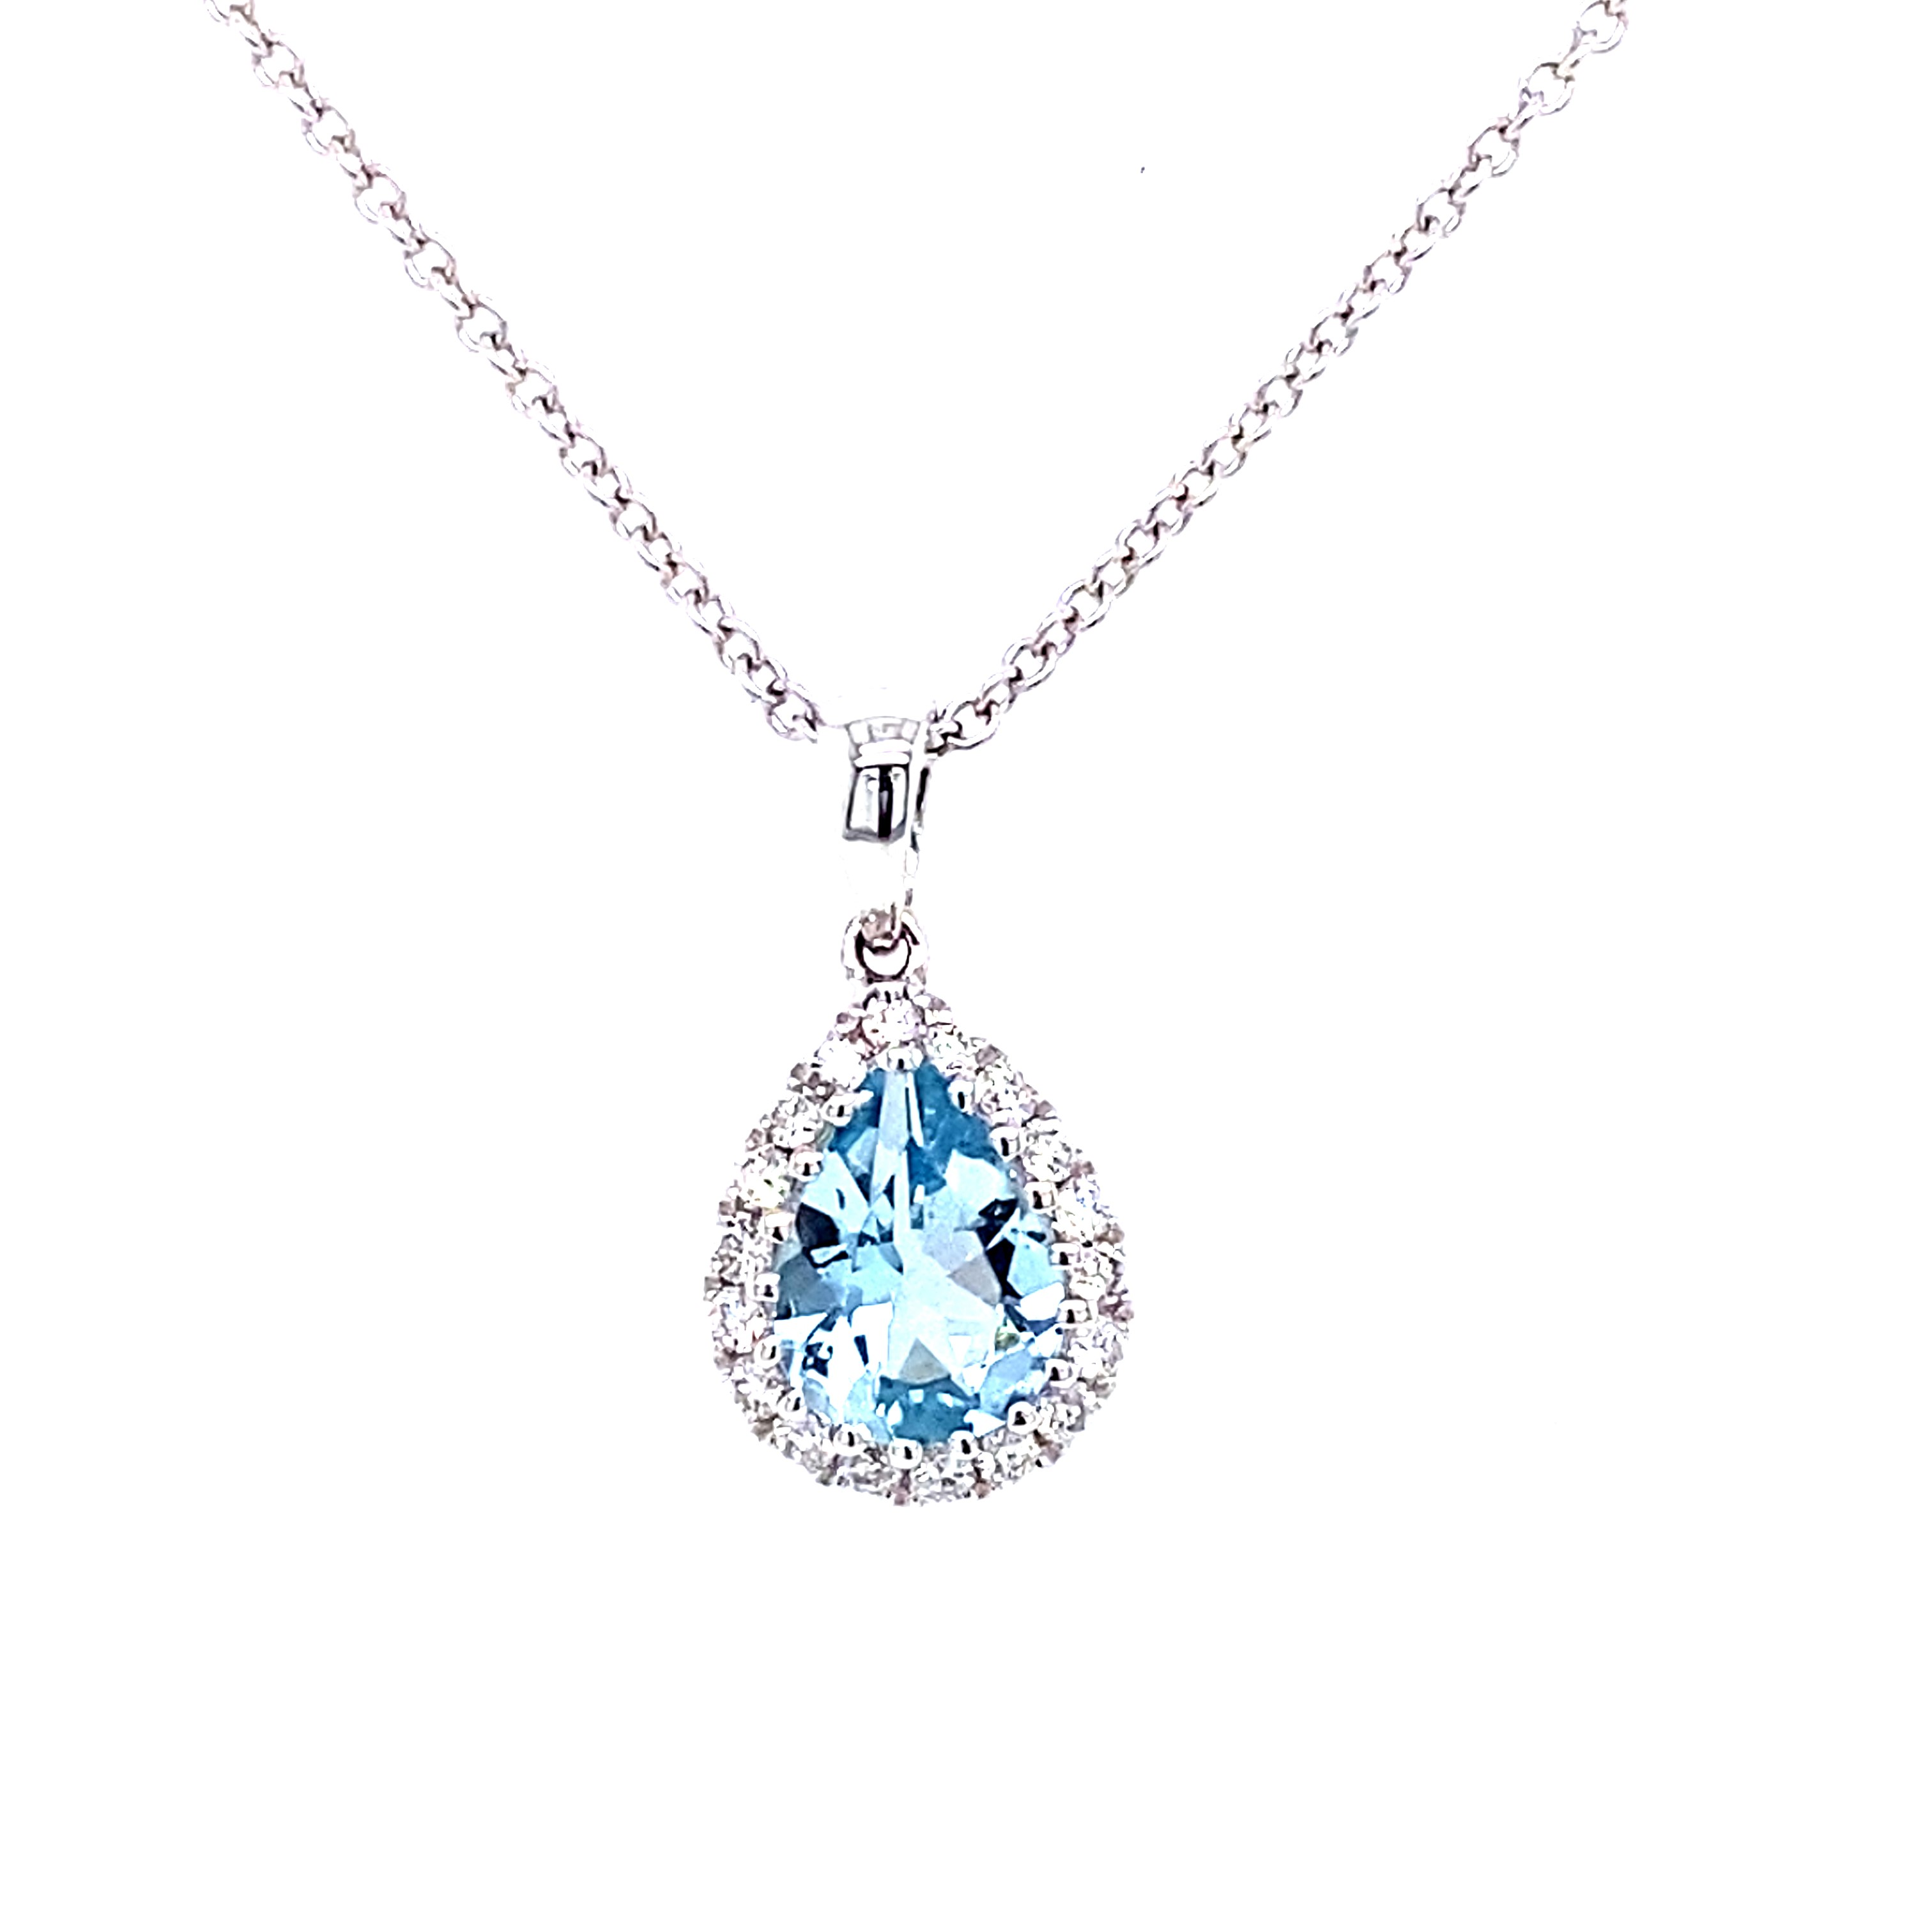 18 Carat White Gold, Pear Shape Aquamarine and Diamond Pendant